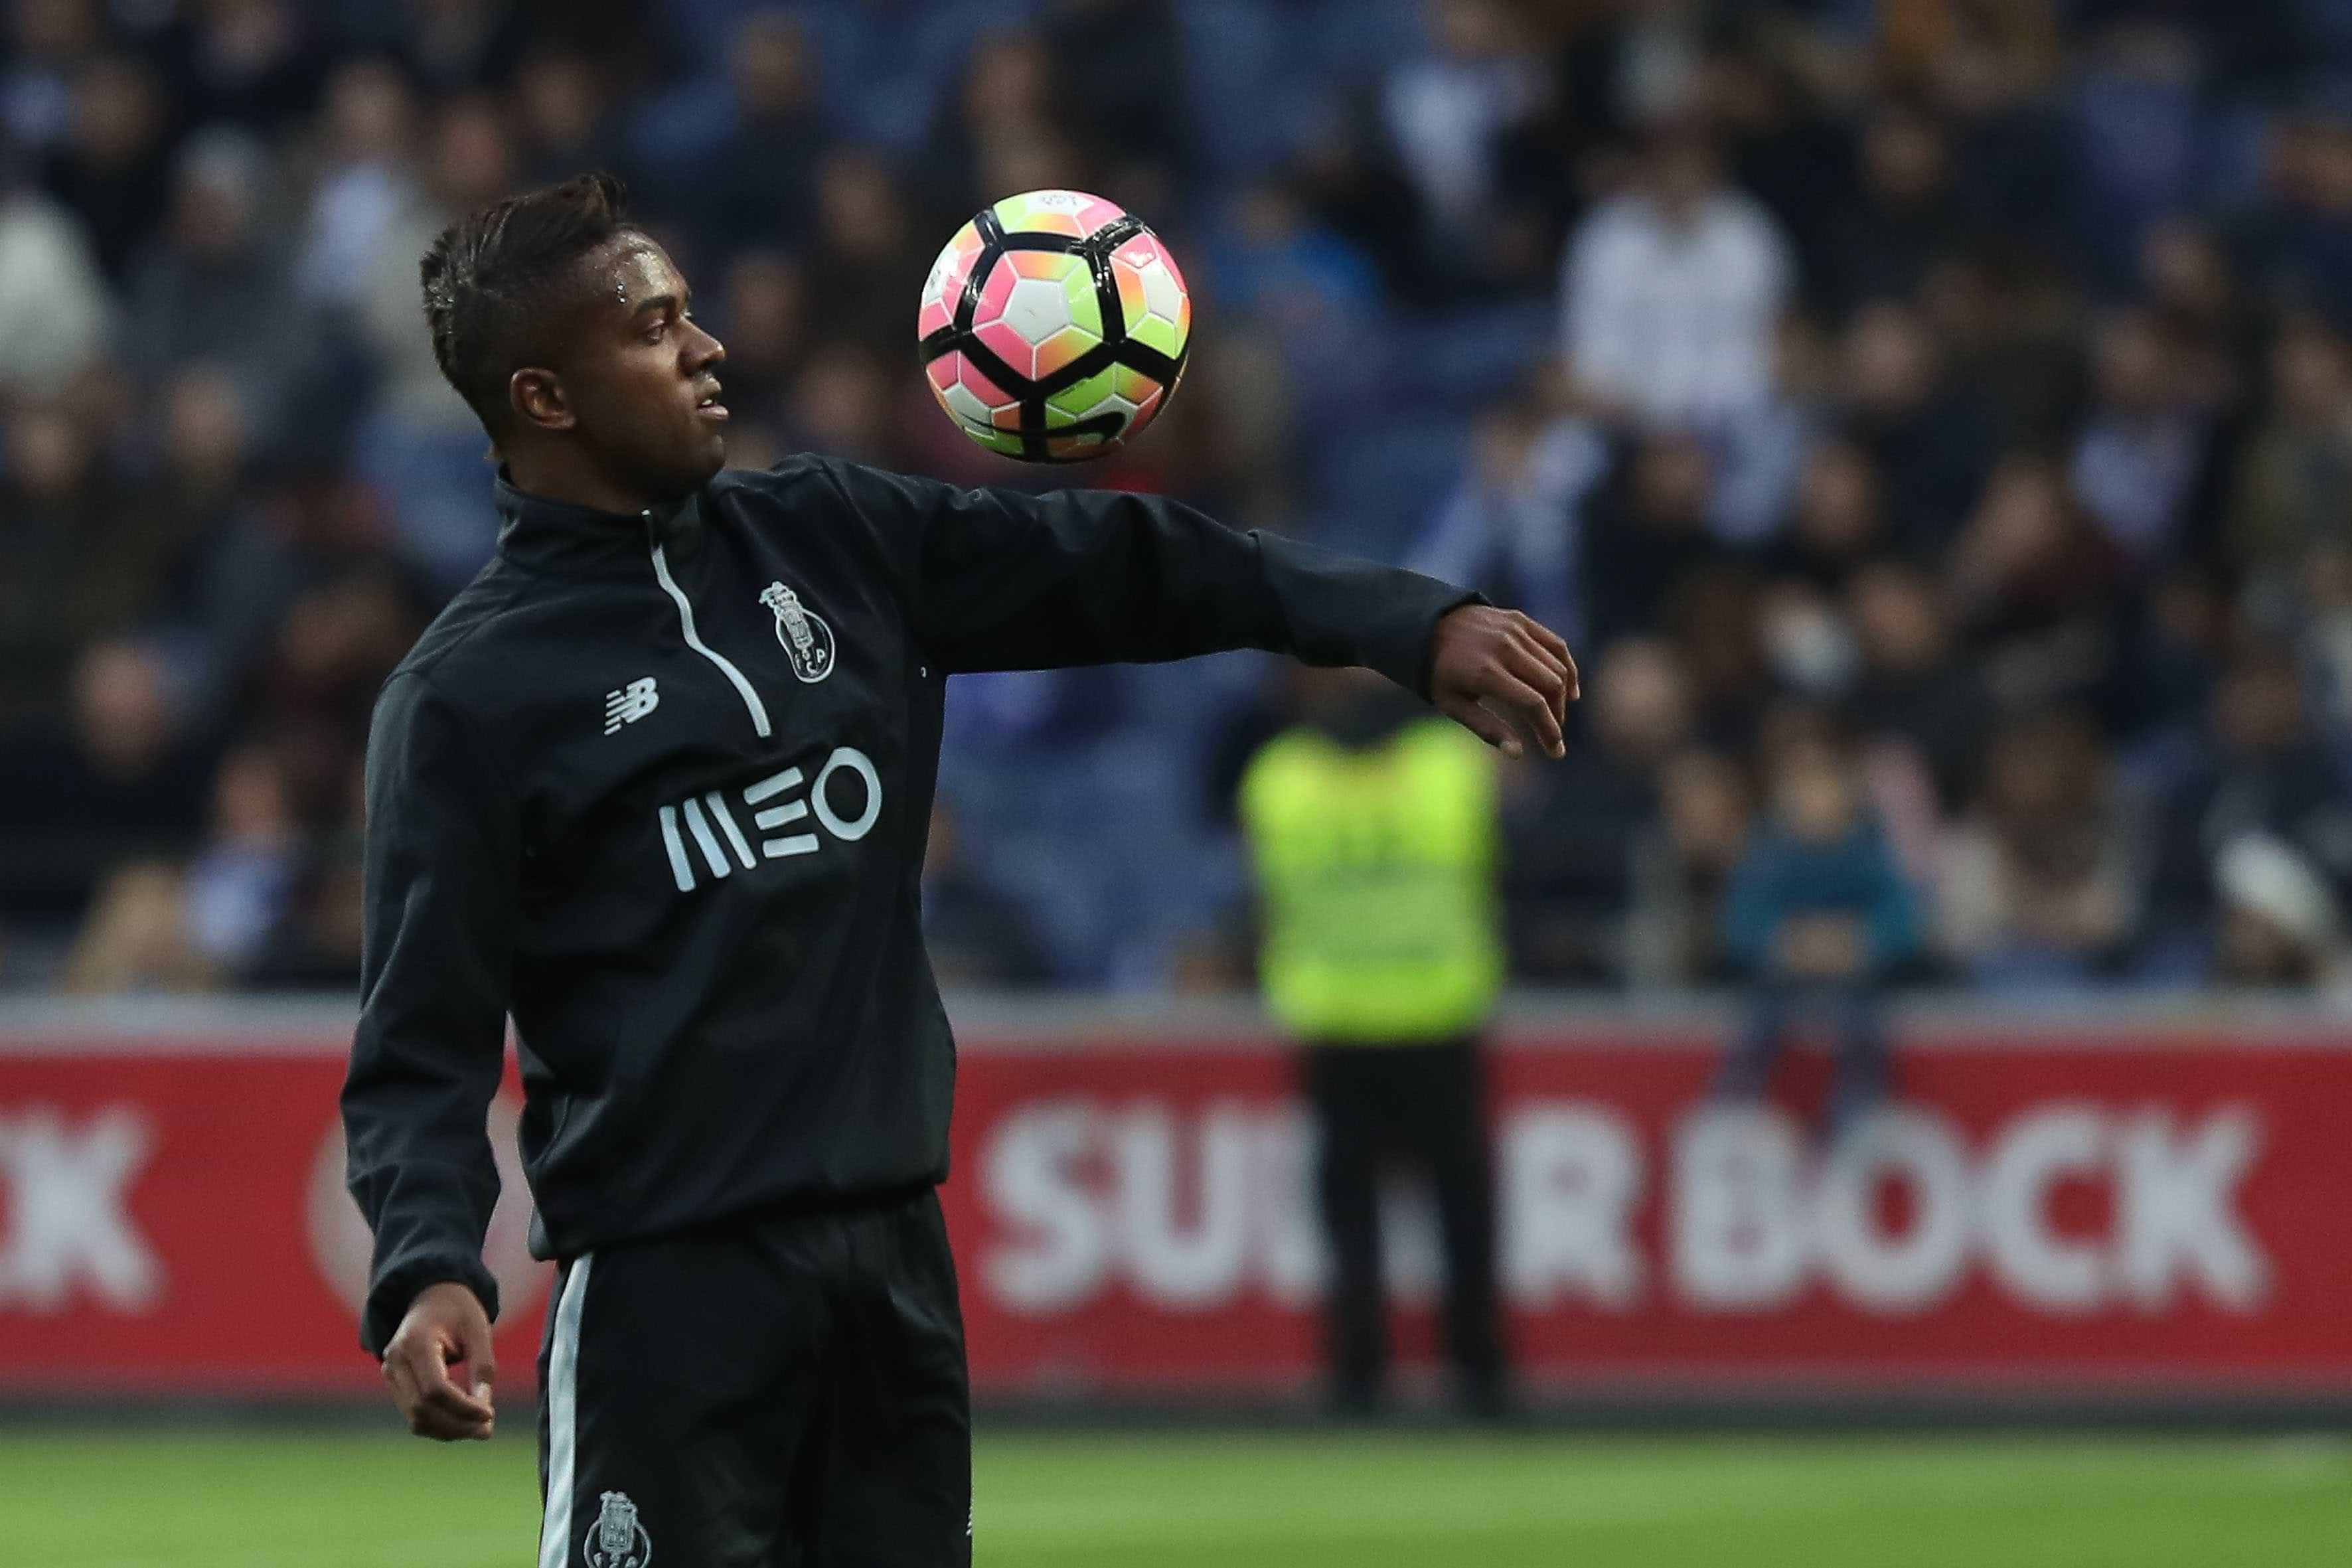 Oficial: FC Porto inscreve Kelvin